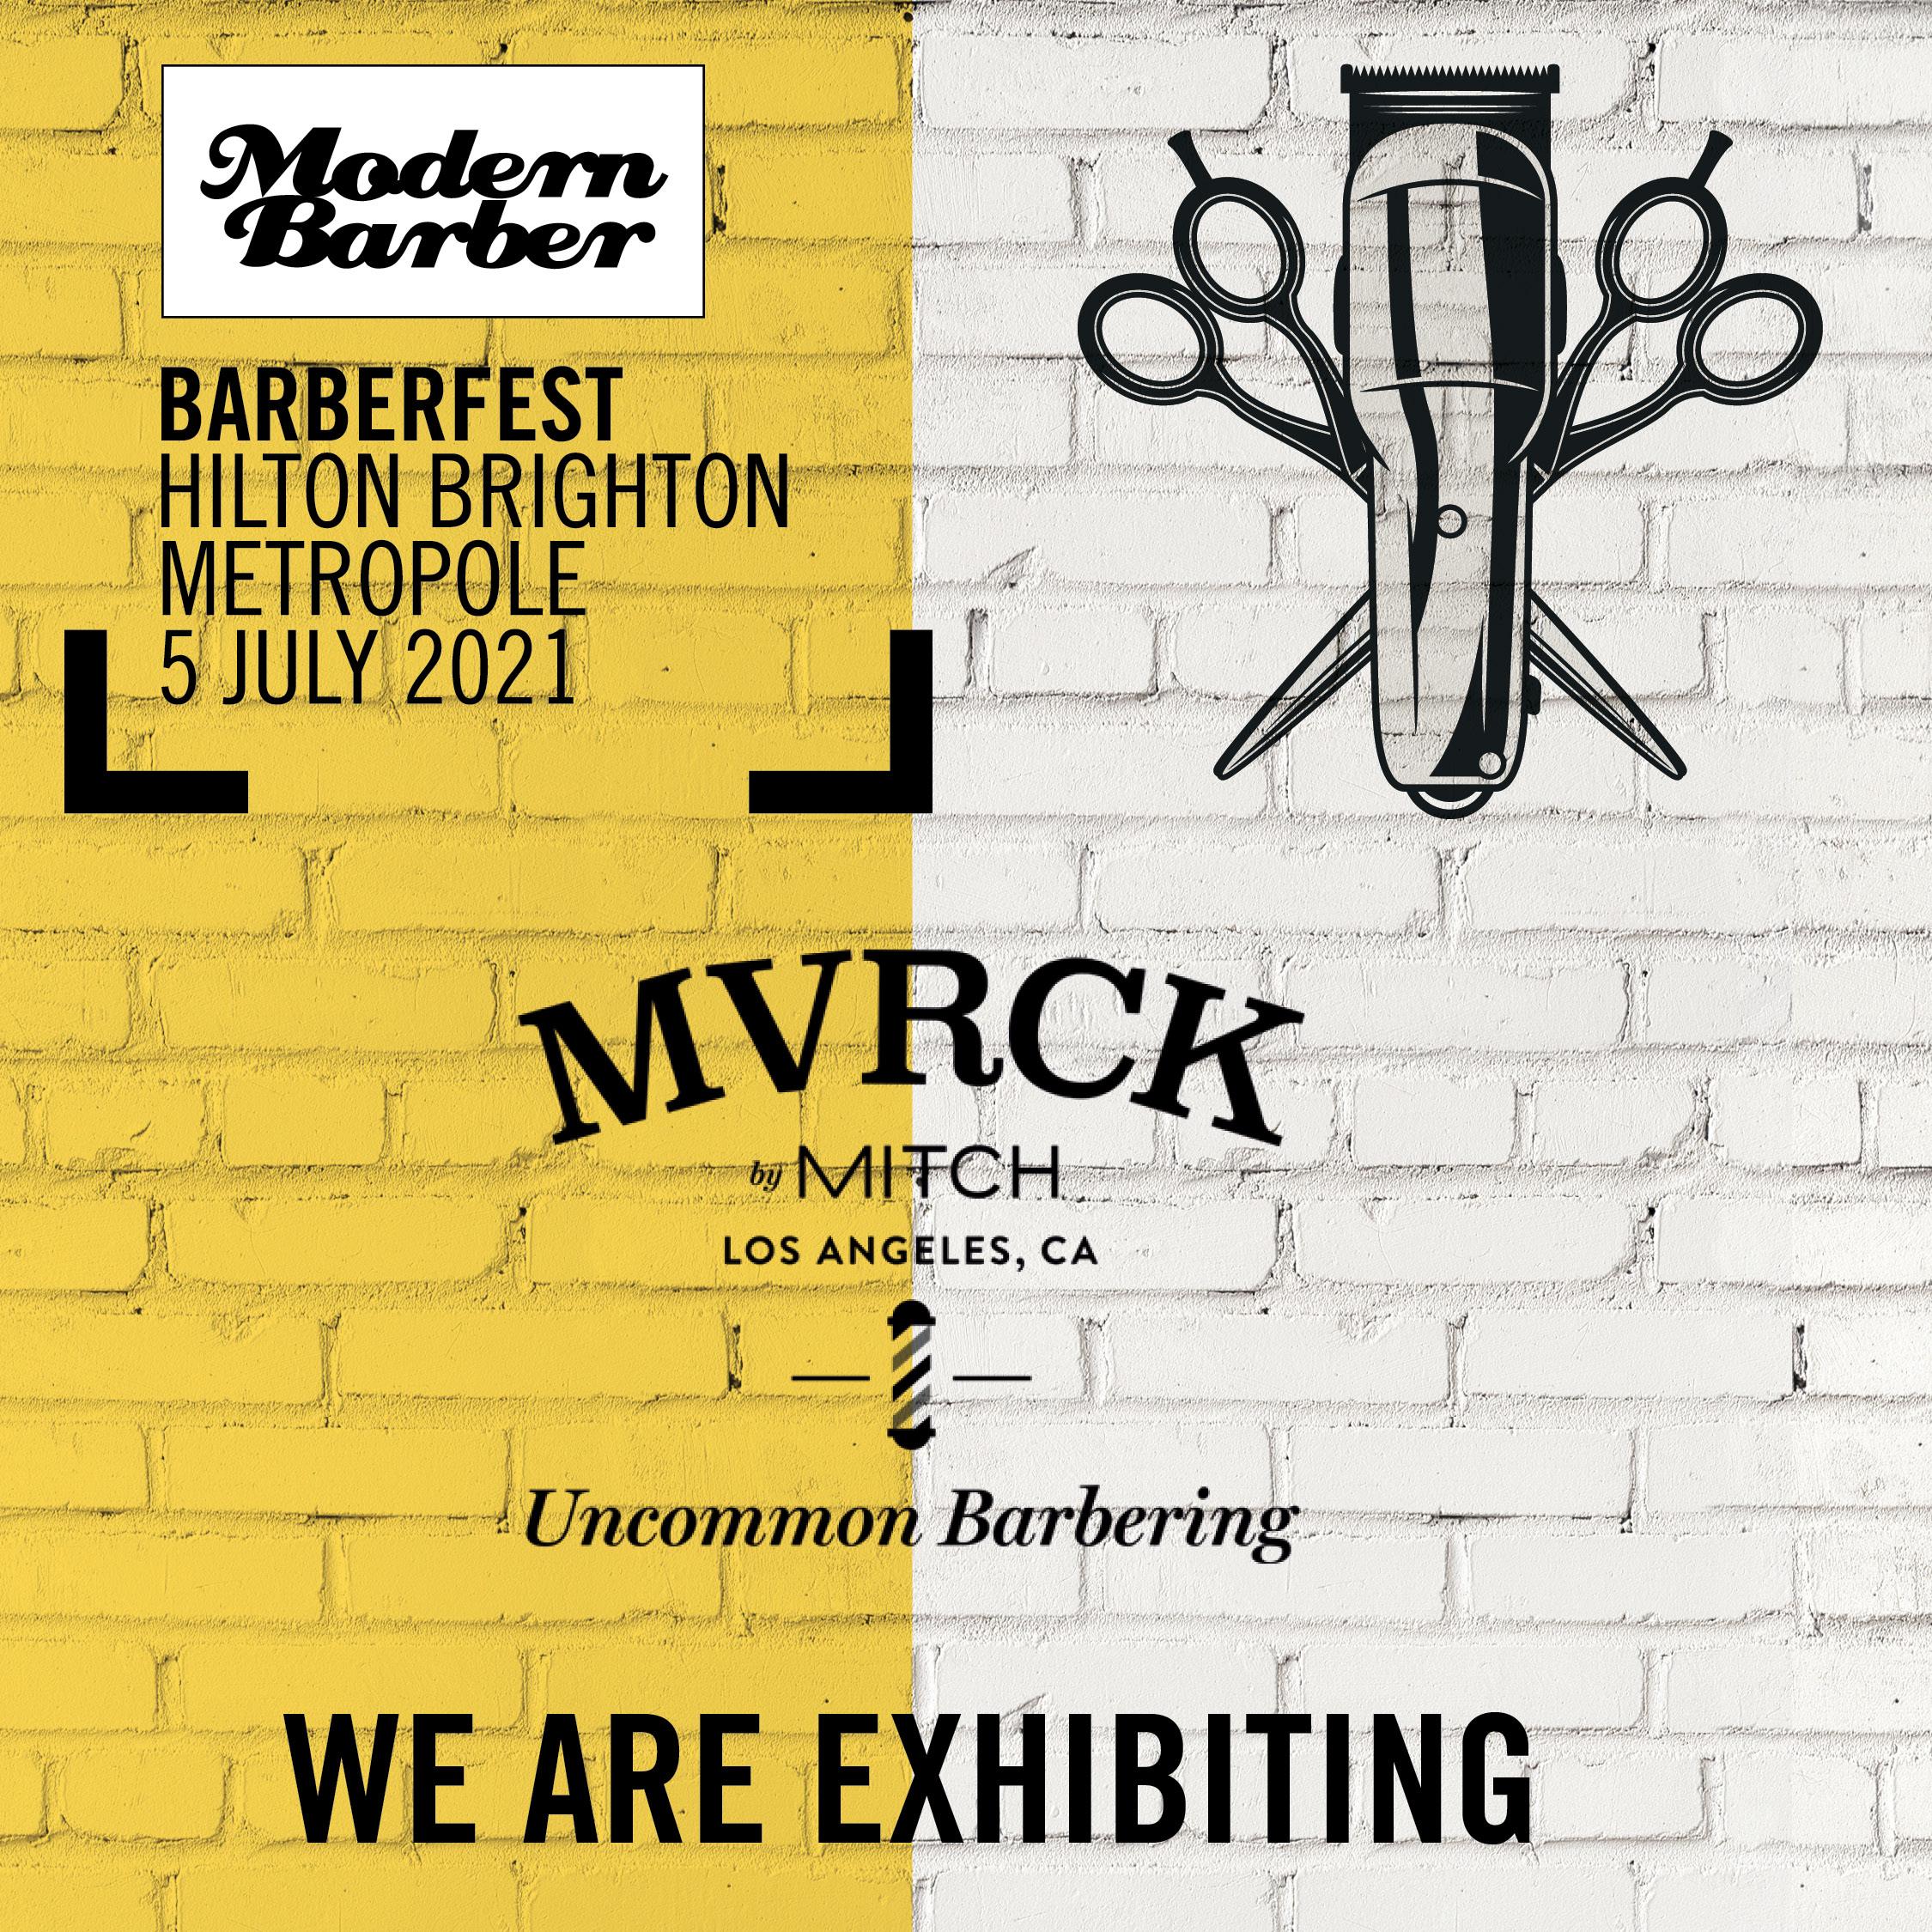 MVRCK Barberfest